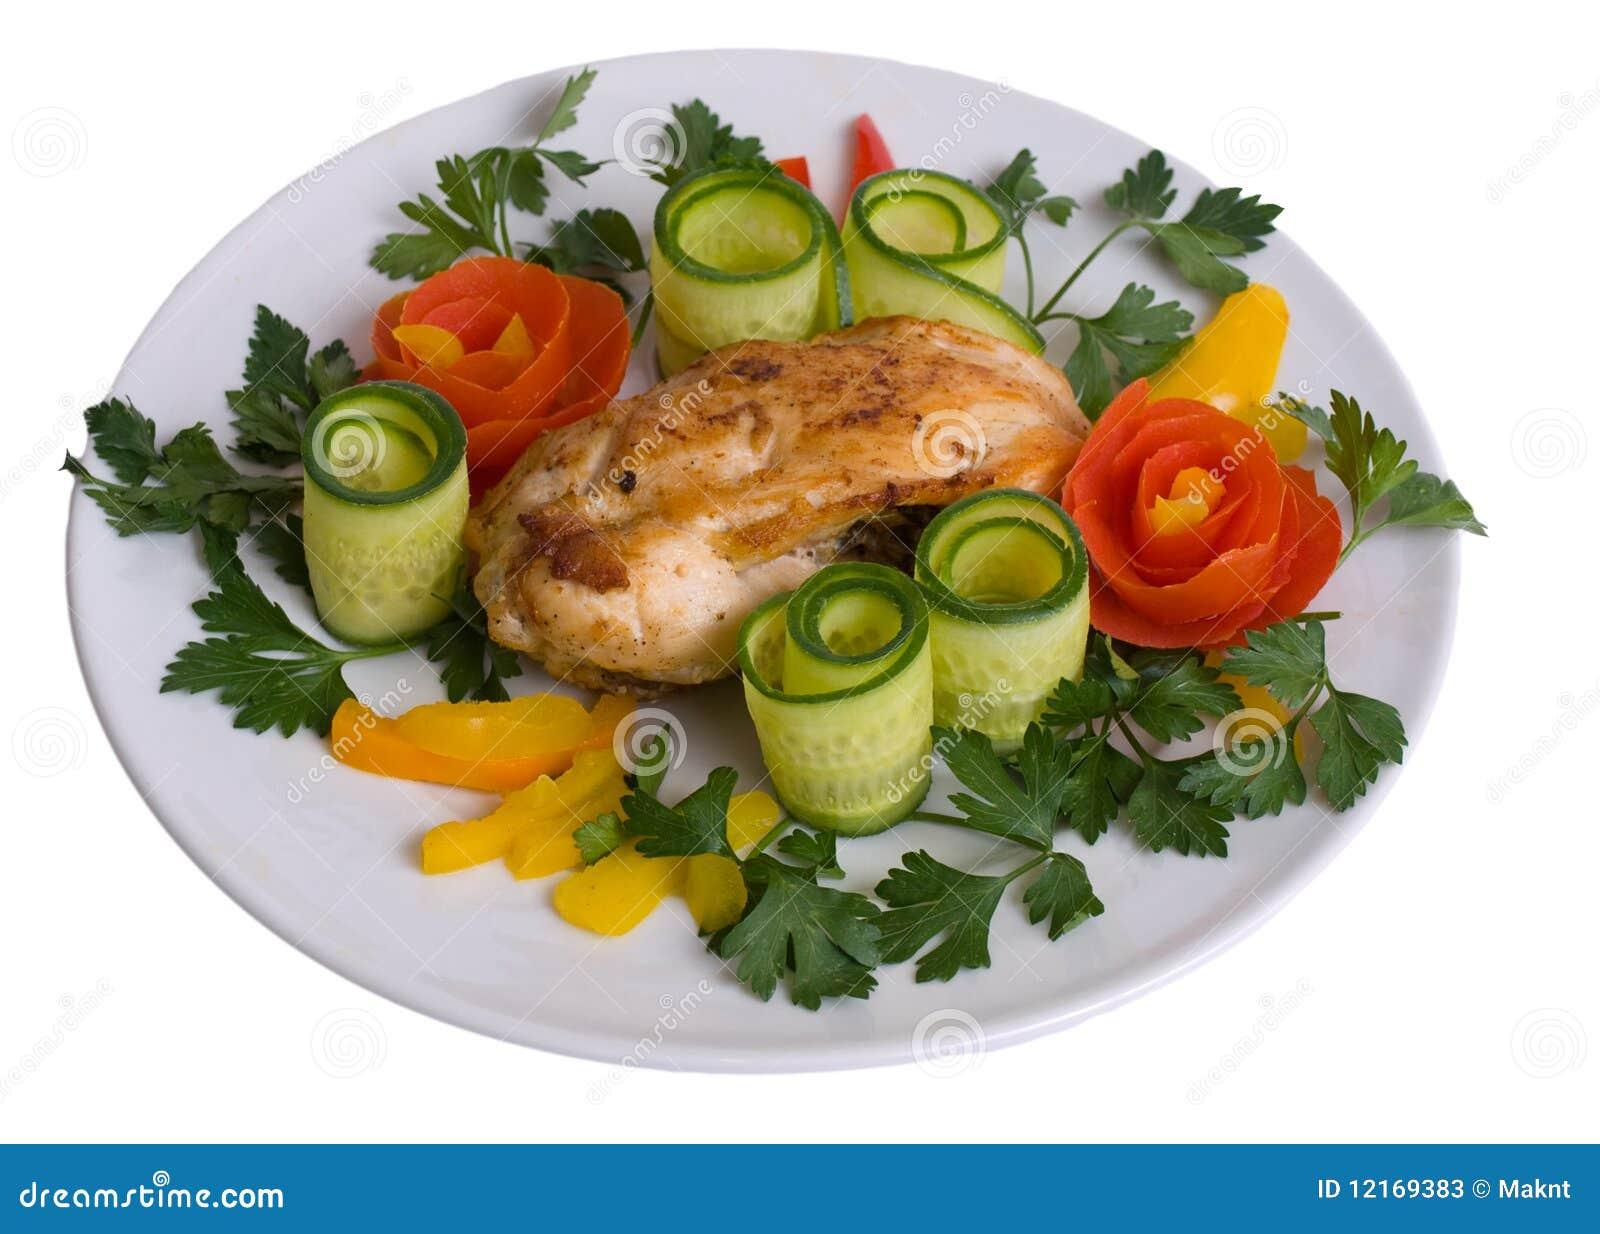 Roast chicken stock image. Image of plate, leaf ...